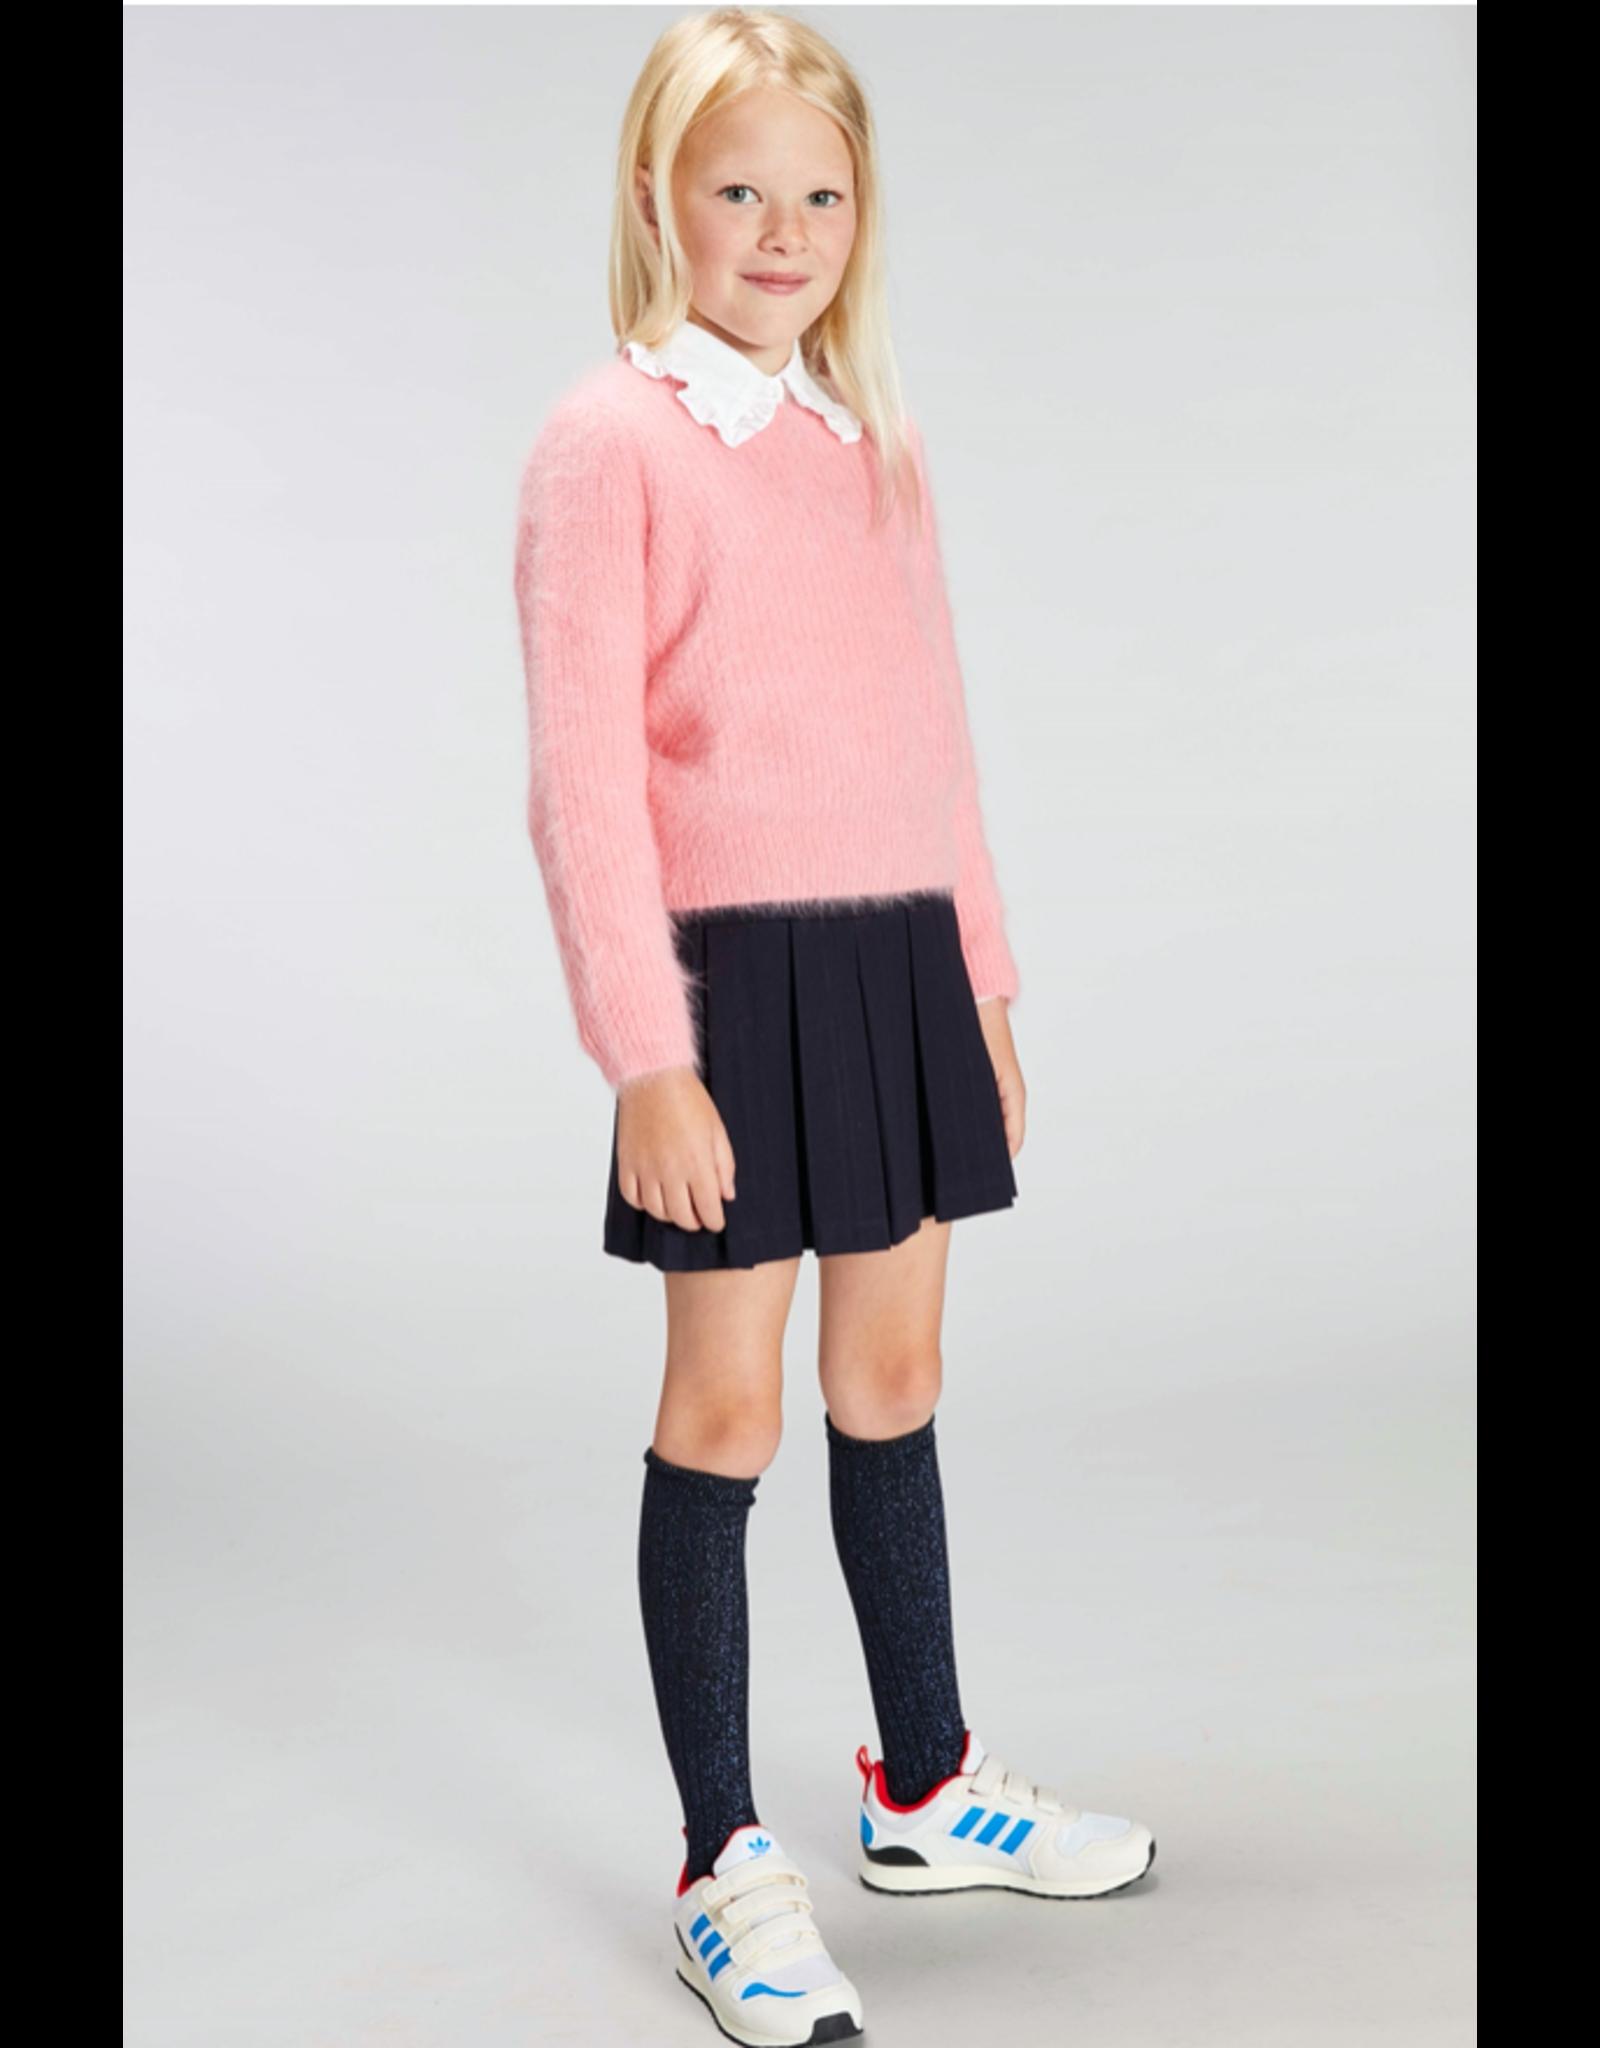 Blue Bay Skirt Kristi darkblue